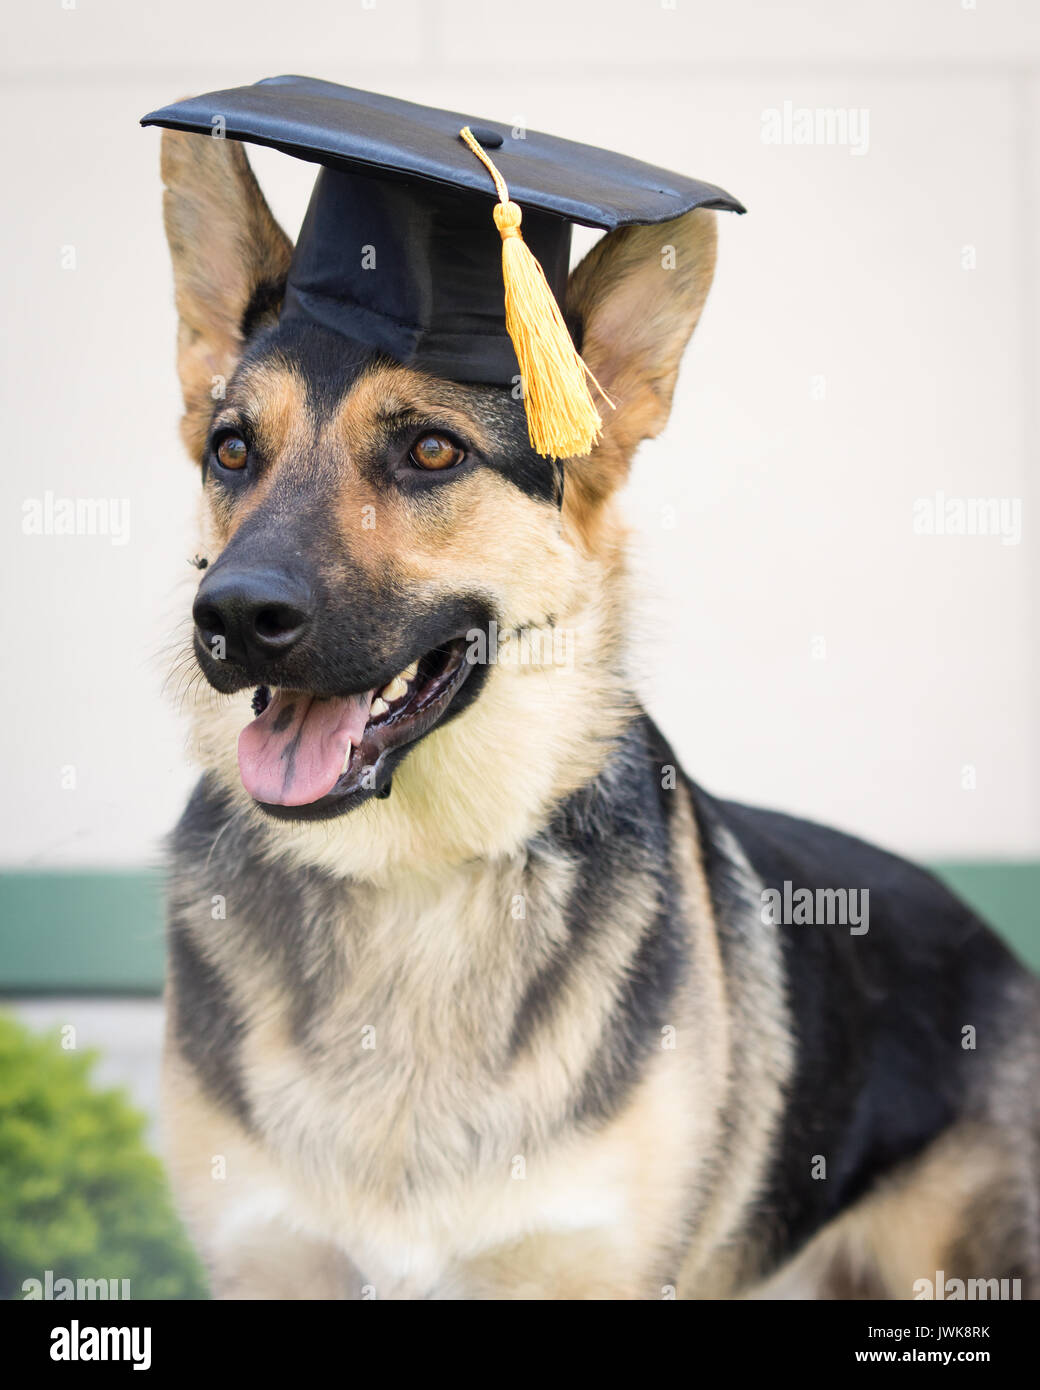 Great Graduation Cap Black Adorable Dog - a-german-shepherd-dog-wearing-a-black-graduation-cap-with-a-yellow-JWK8RK  Trends_792346  .jpg